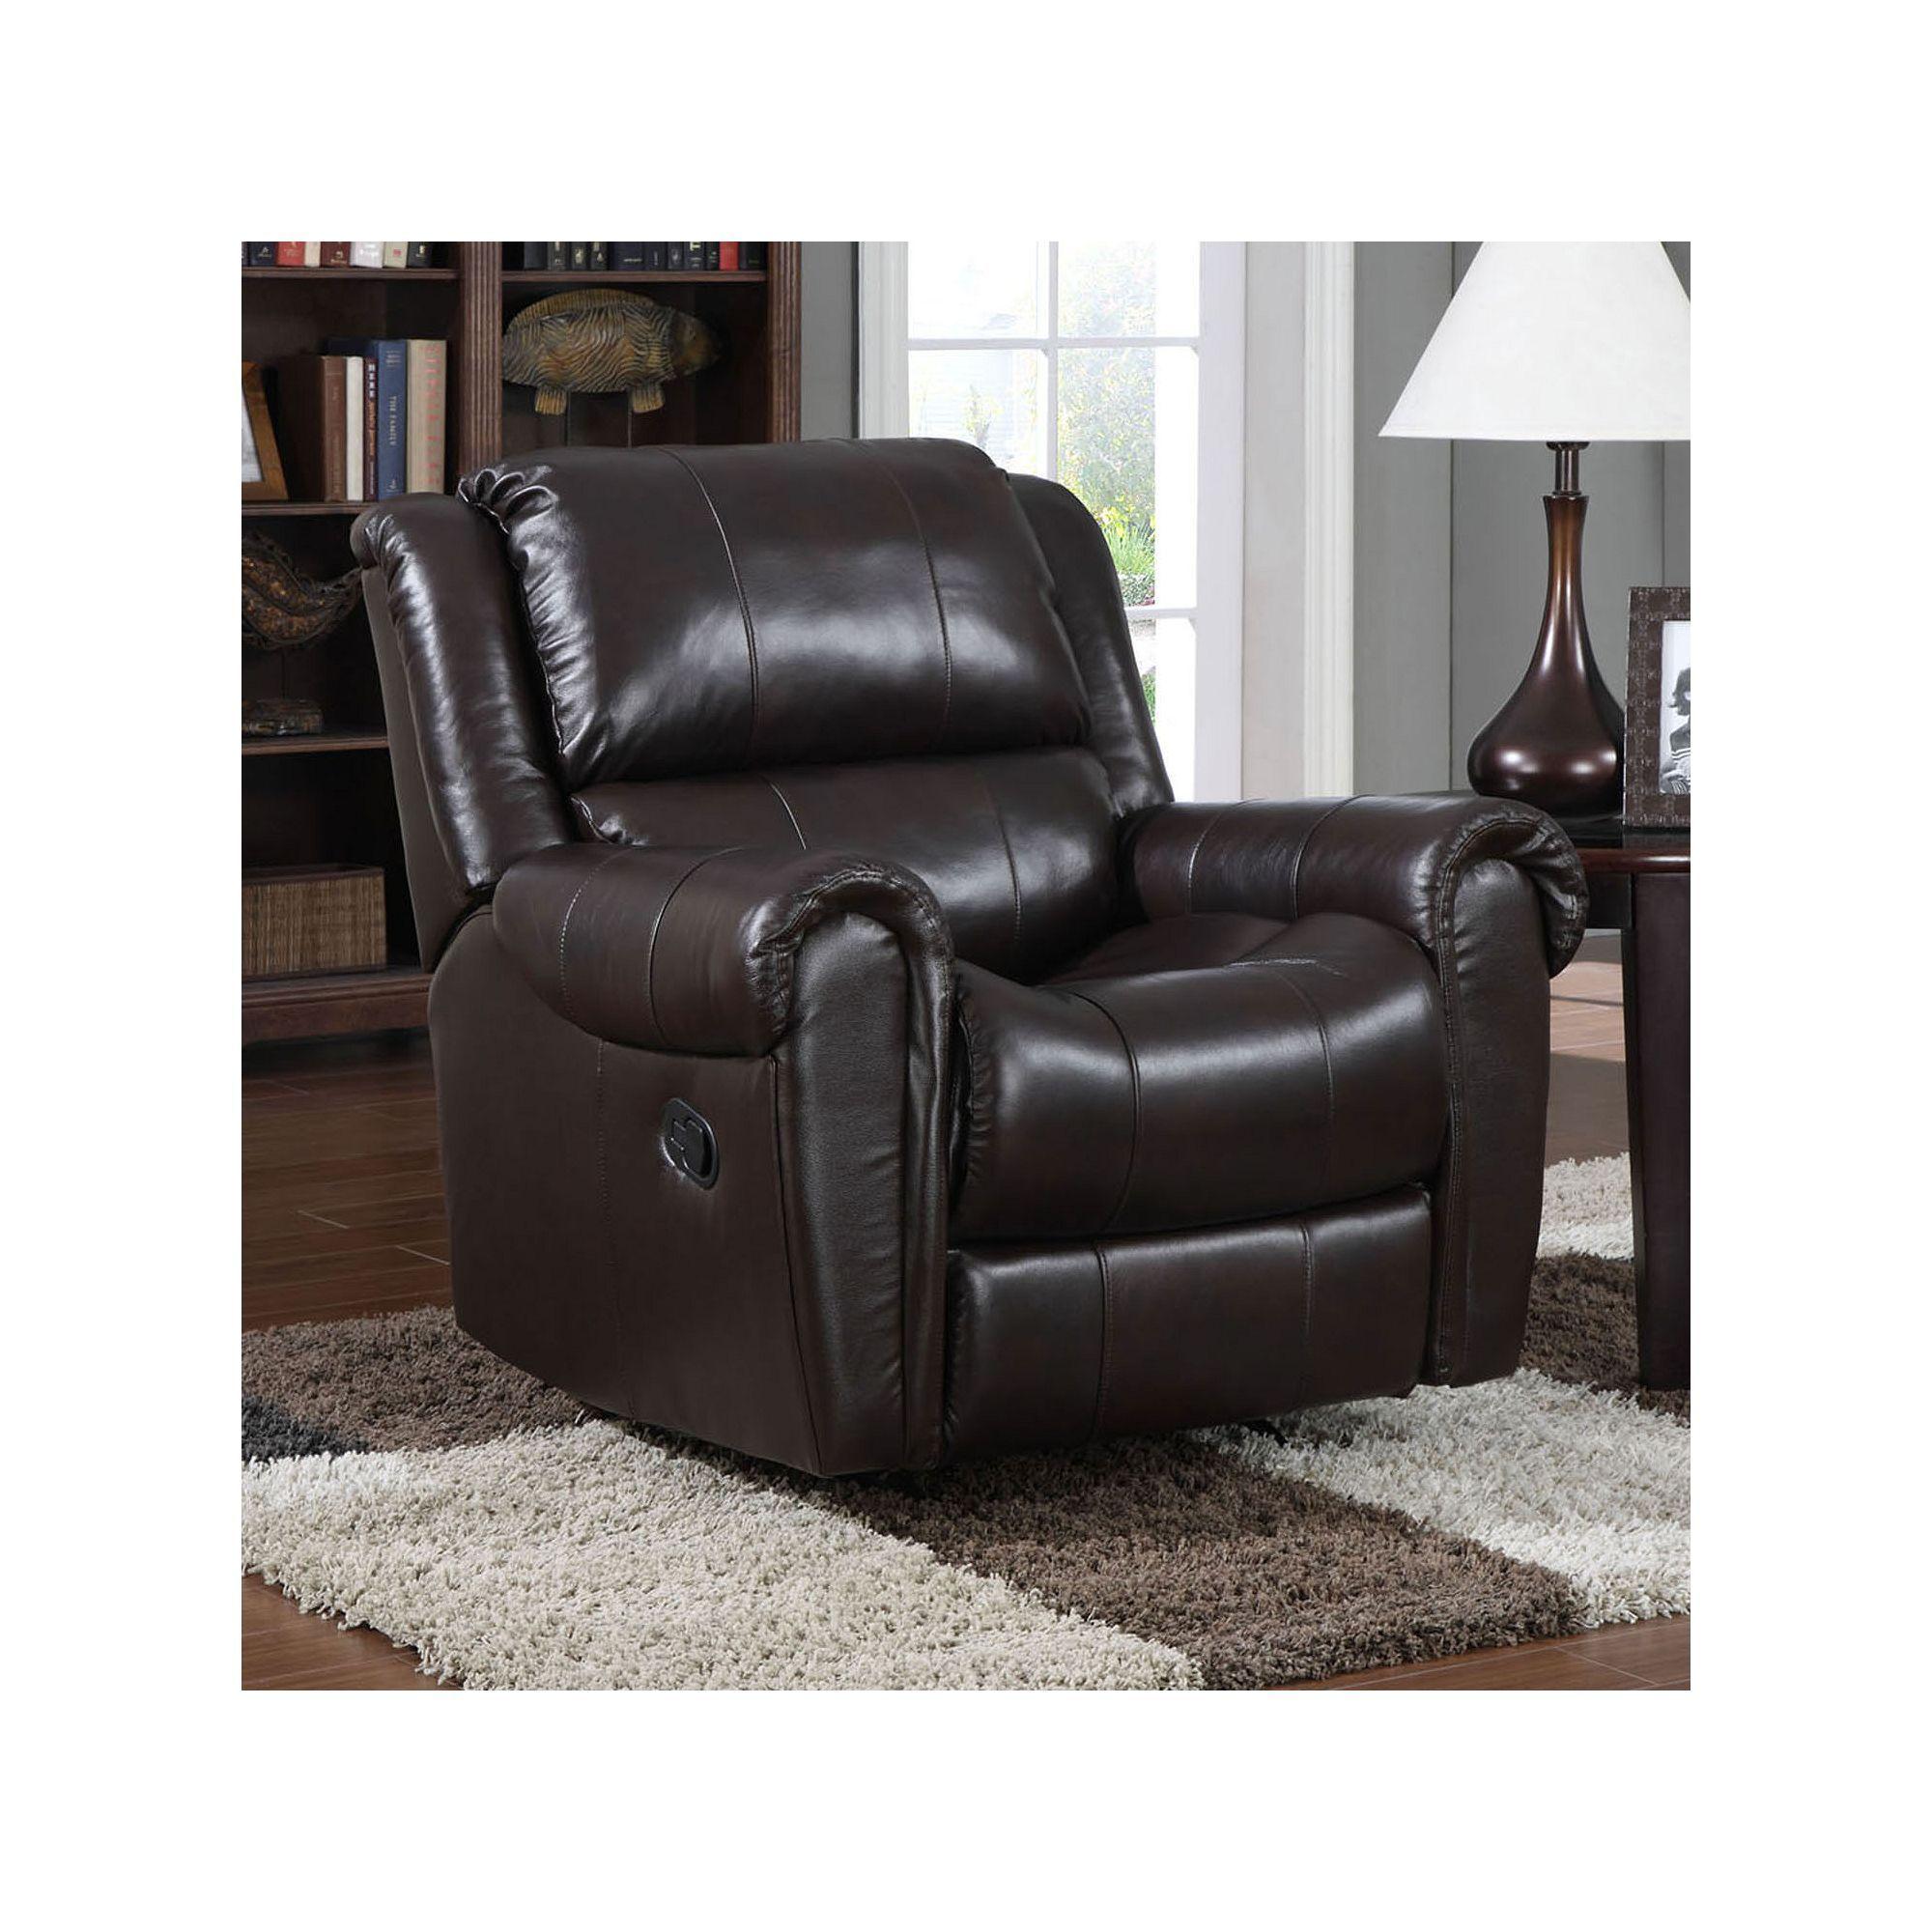 Pulaski Odie Rocker Recliner Chair, Brown reclinerchair